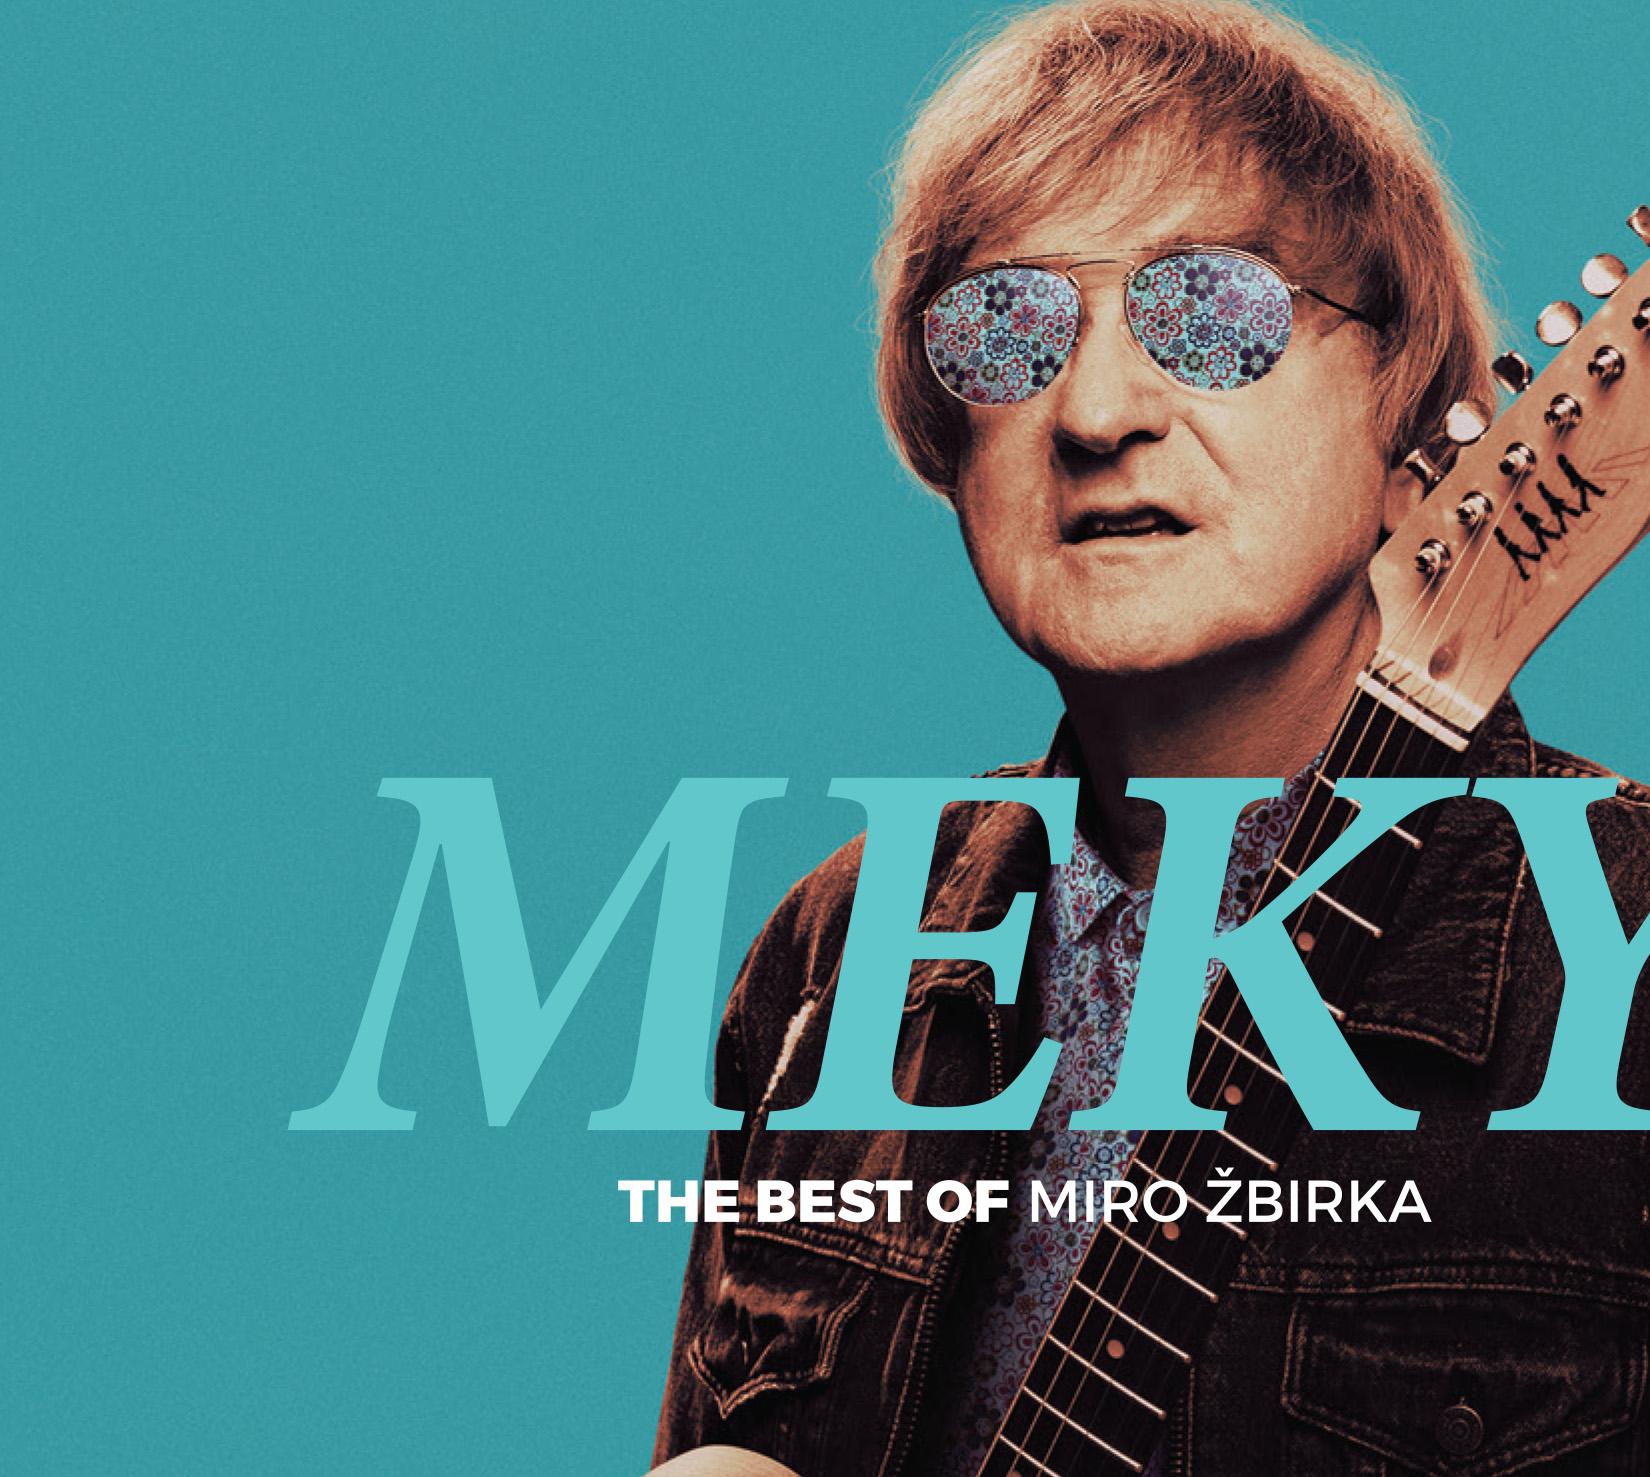 CD Shop - ZBIRKA MIRO THE BEST OF MIRO ZBIRKA